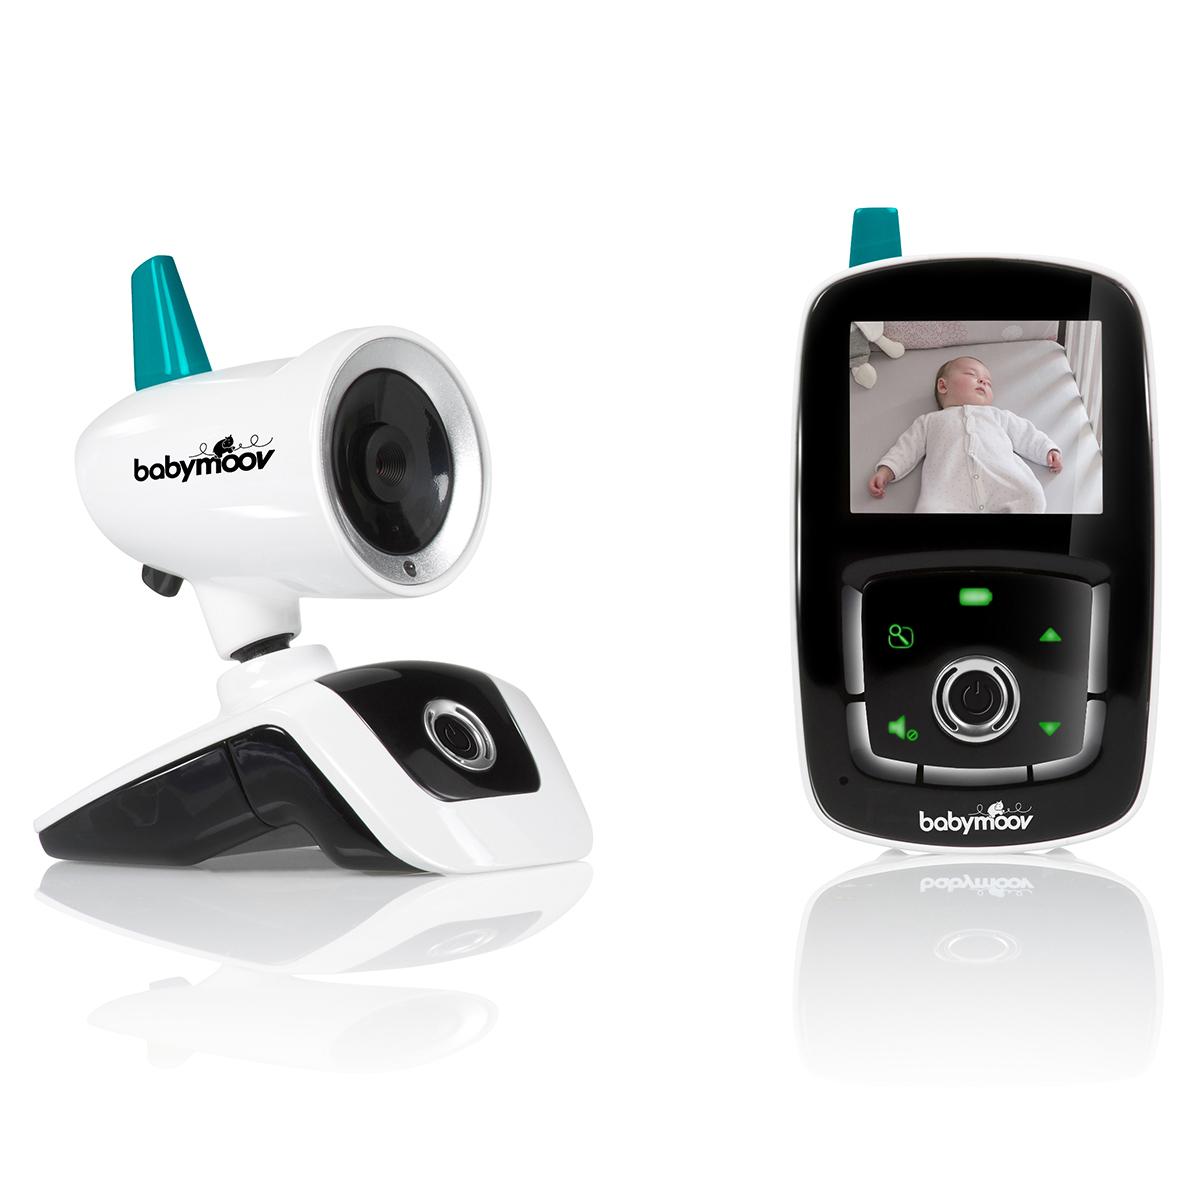 Écoute bébé Babyphone Video Yoo Care Babyphone Video Yoo Care